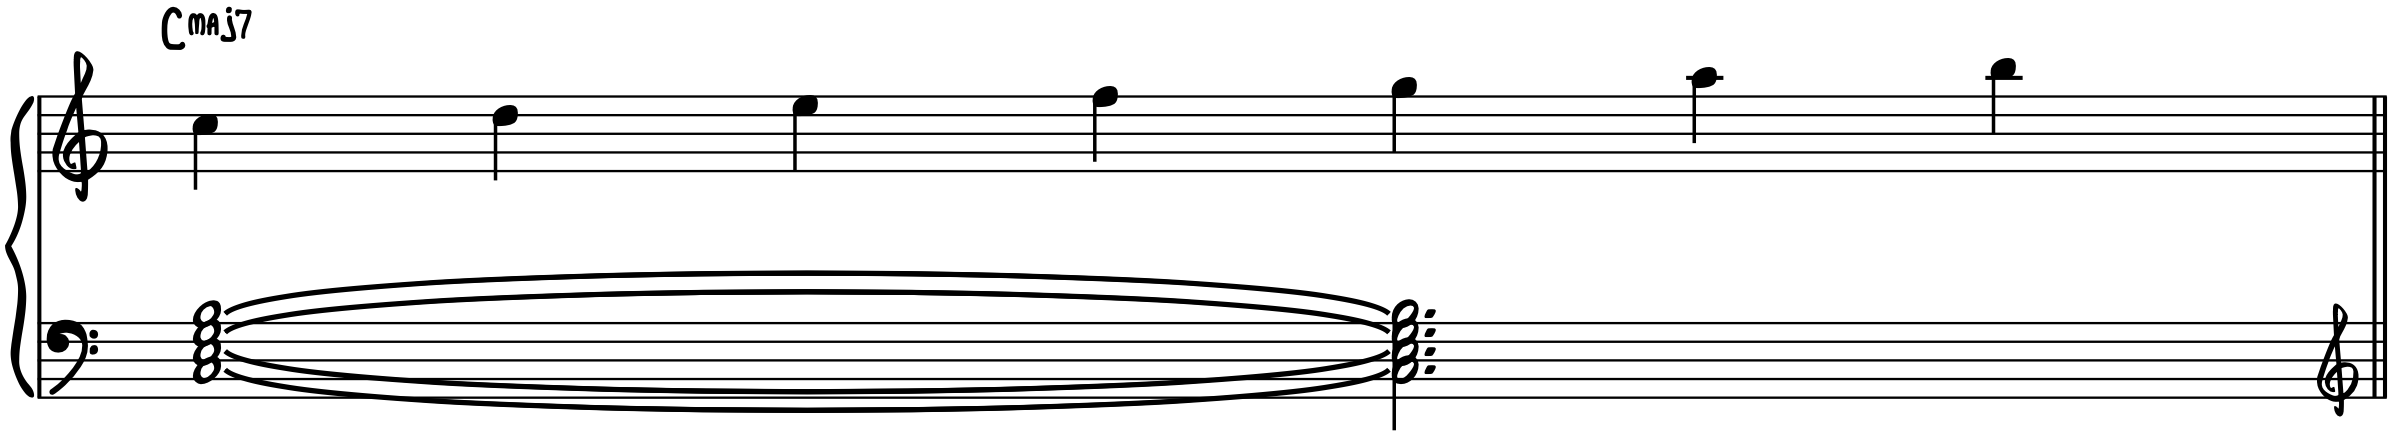 Step 1-Melody